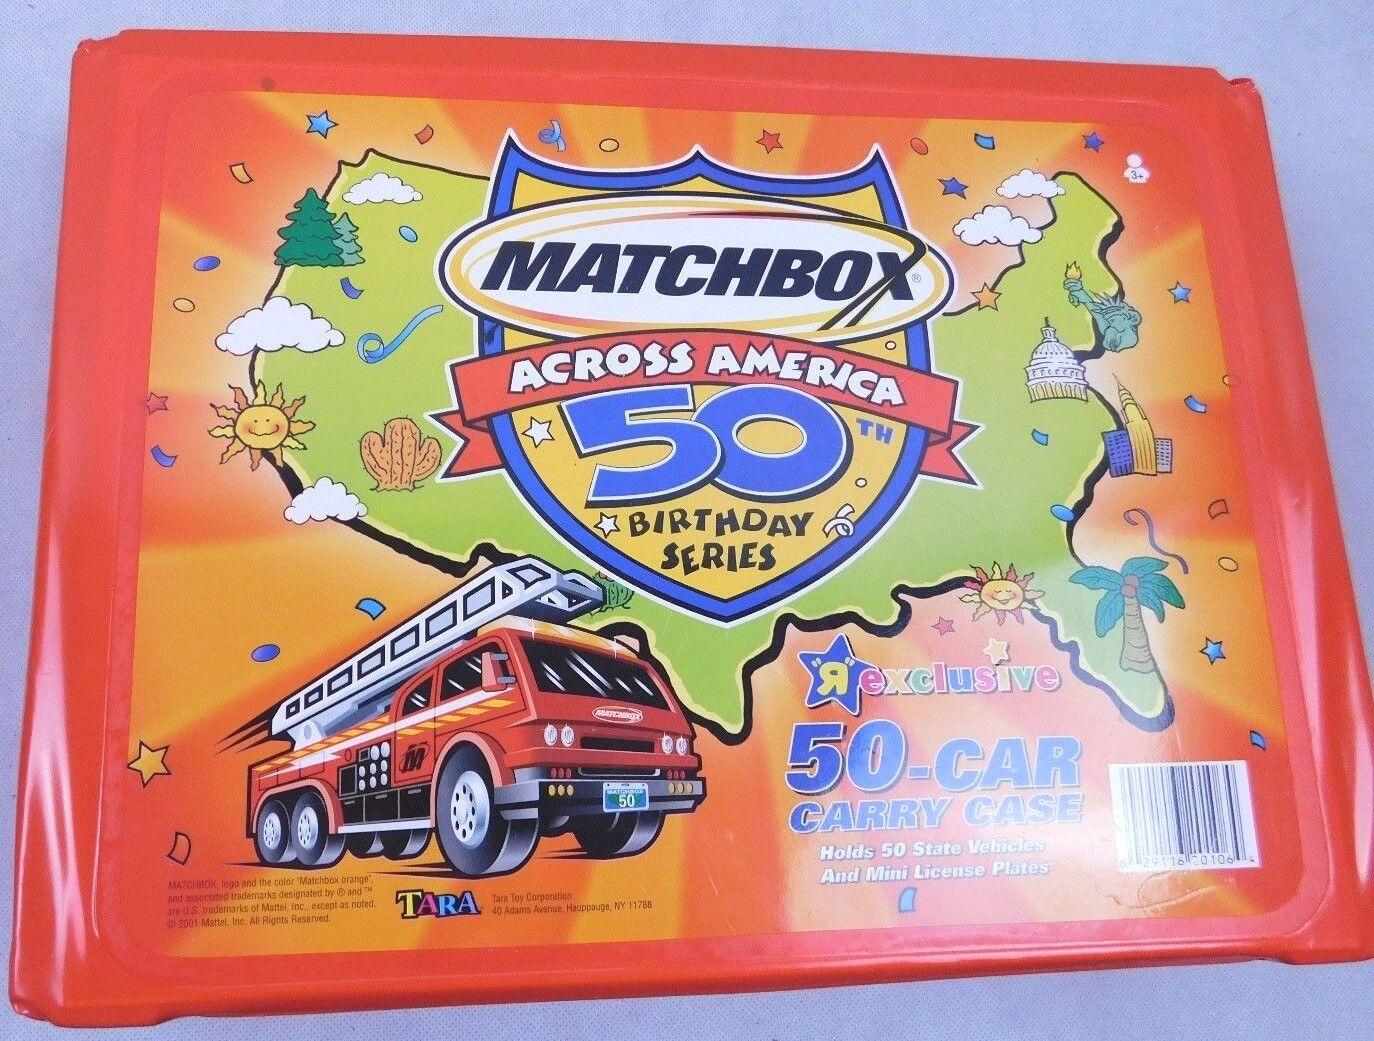 Matchbox Across  America 50th Birthday Series voiture voiturery Case With 50 voitures  vente discount en ligne